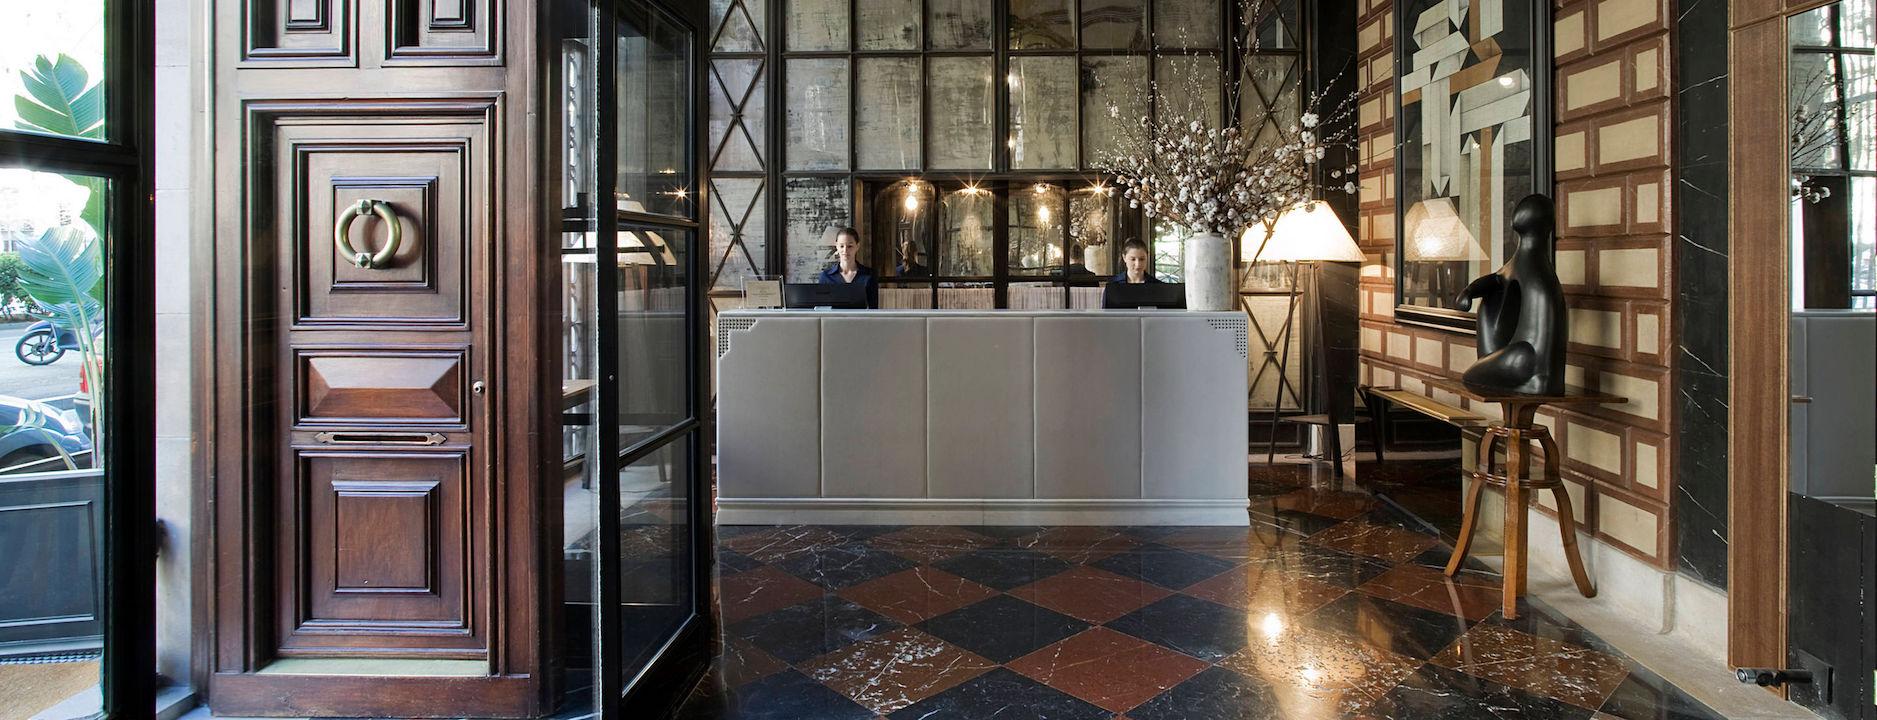 Cotton House Hotel ***** Barcelona / Spain